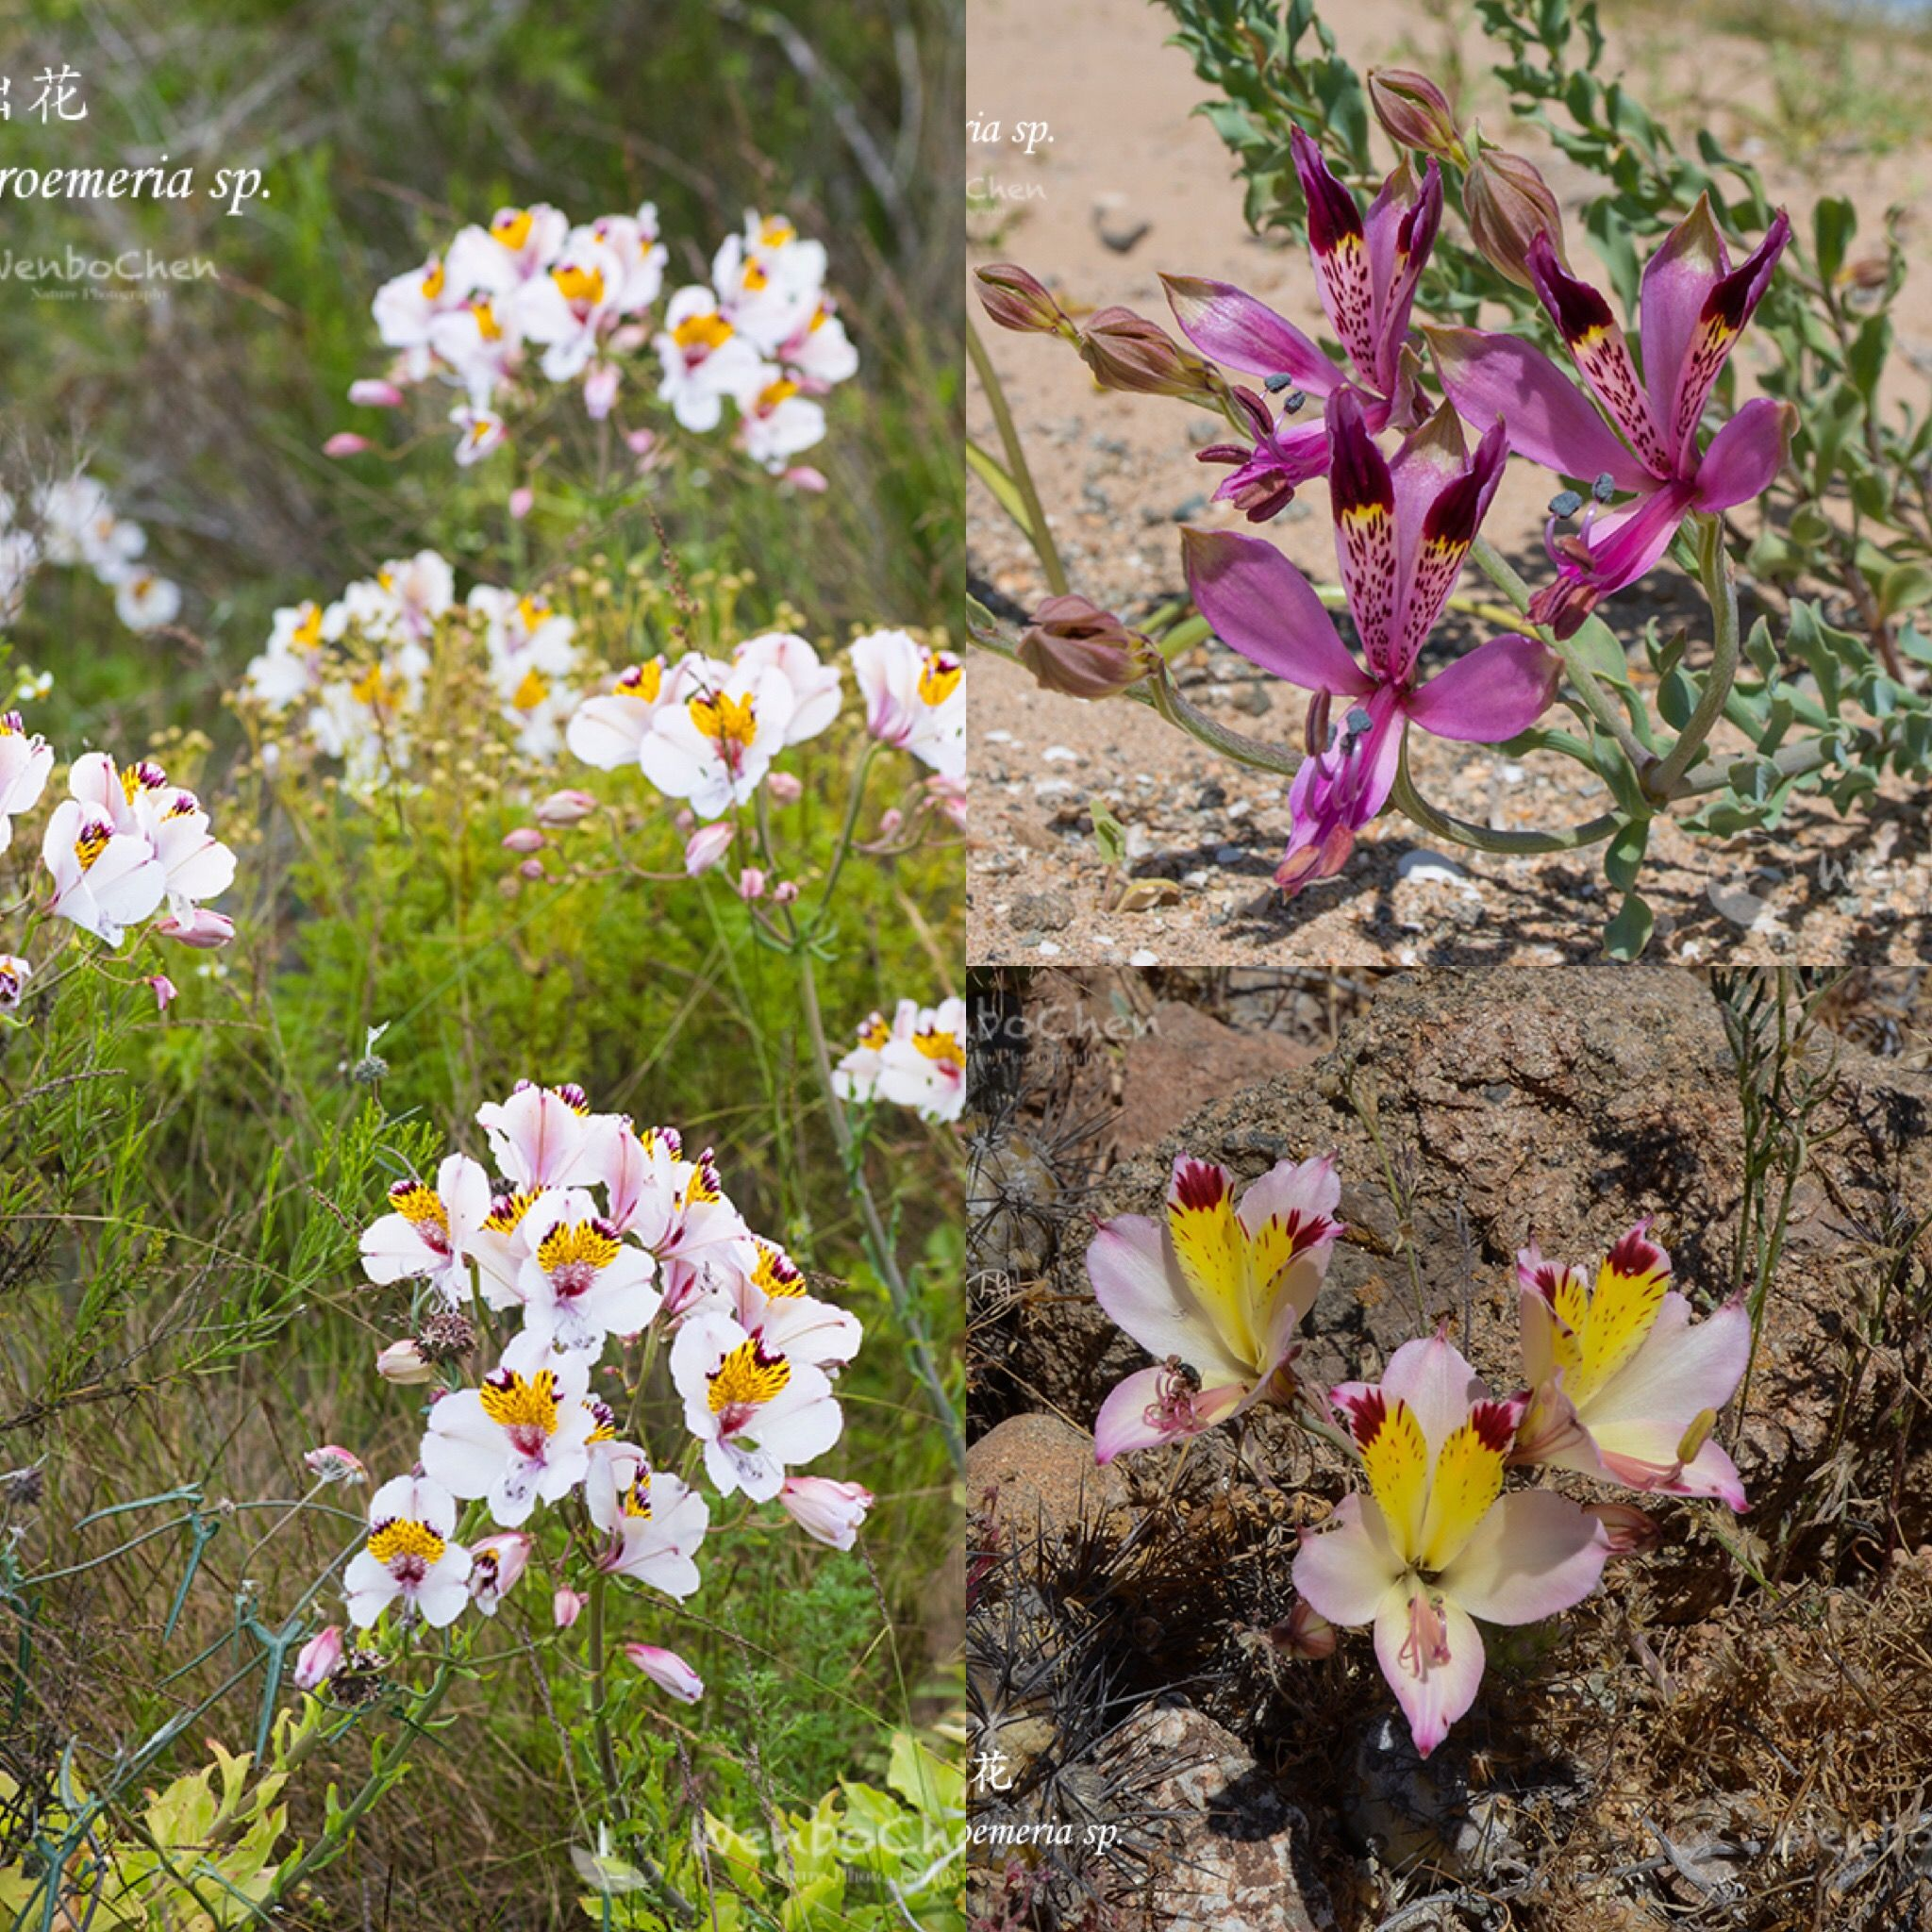 Alstroemeria Species In Chile Oct 2017 Alstroemeria Flora Flowers